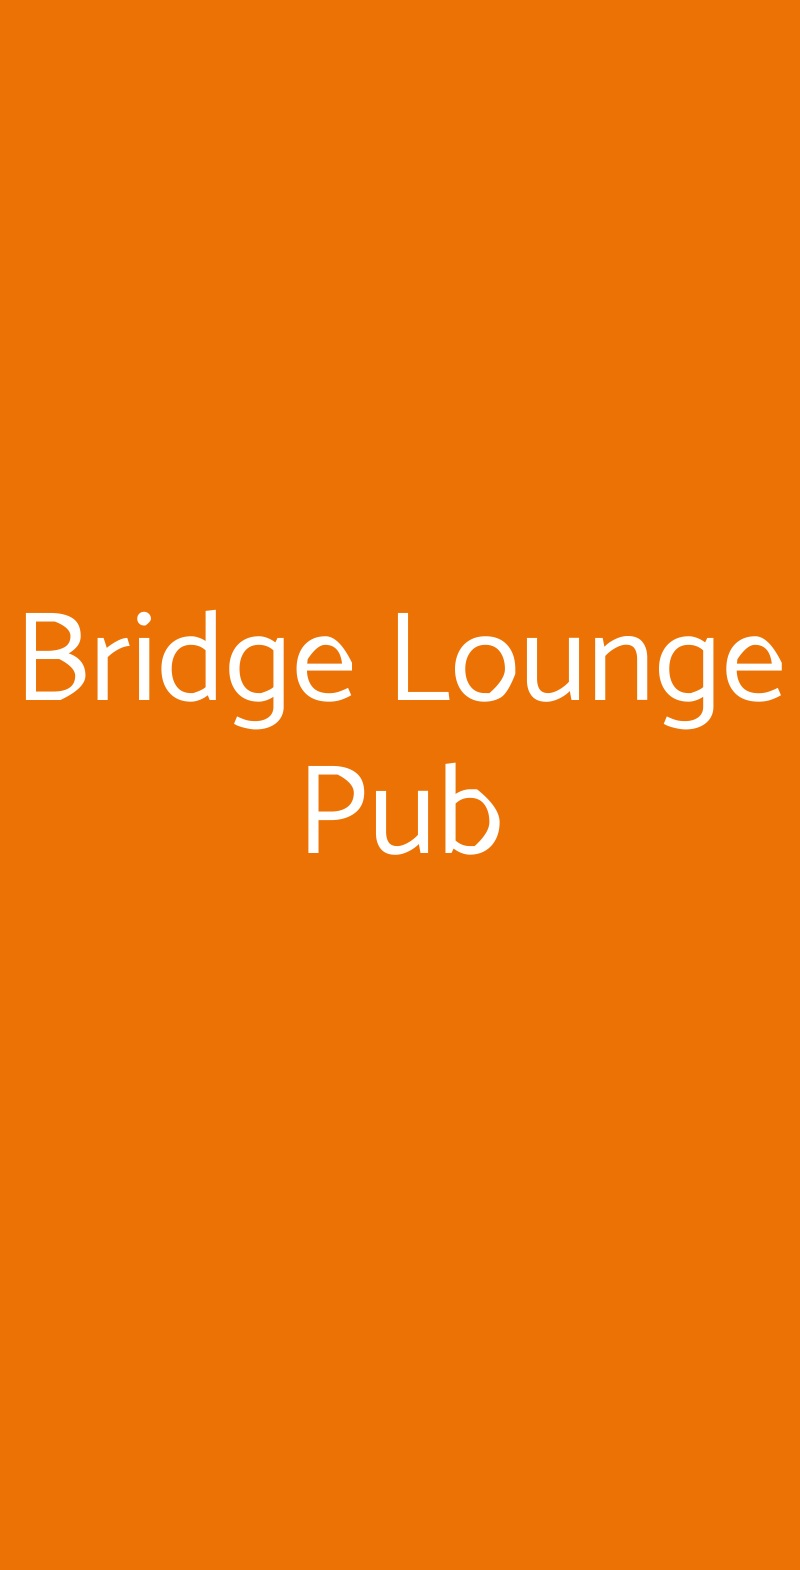 Bridge Lounge Pub Reggio Calabria menù 1 pagina